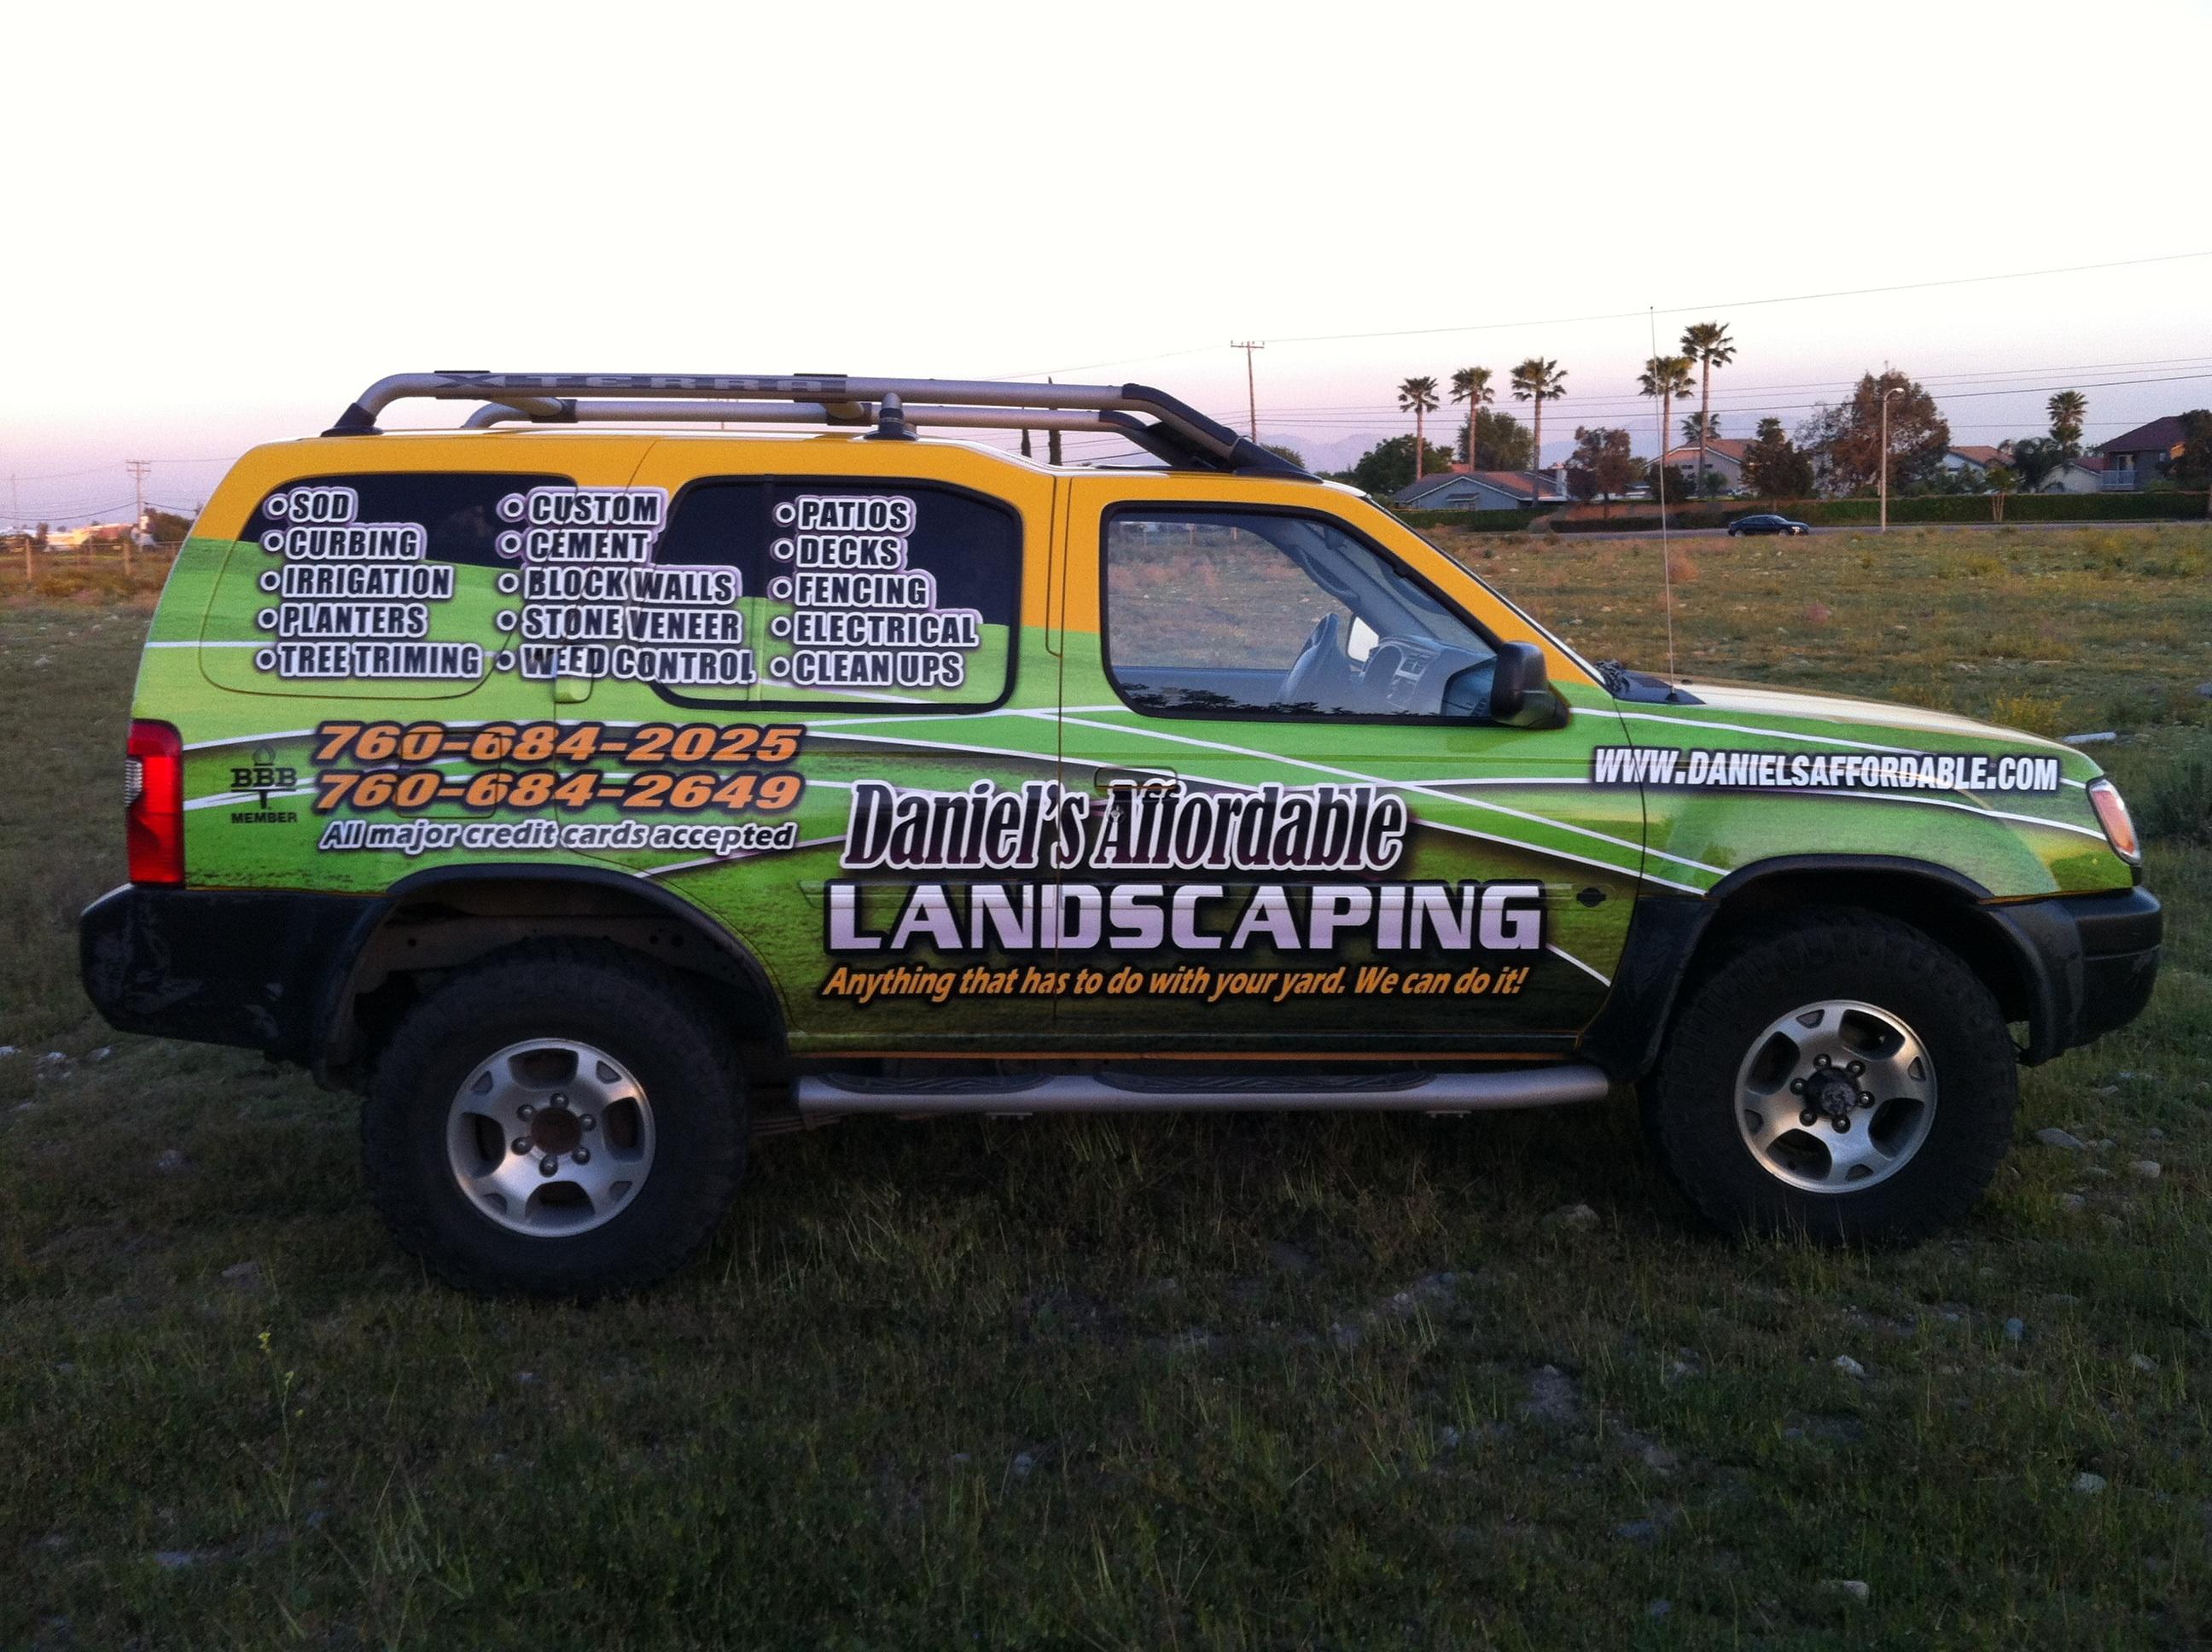 Lawn Care Graphics Vehicle wraps & graphics